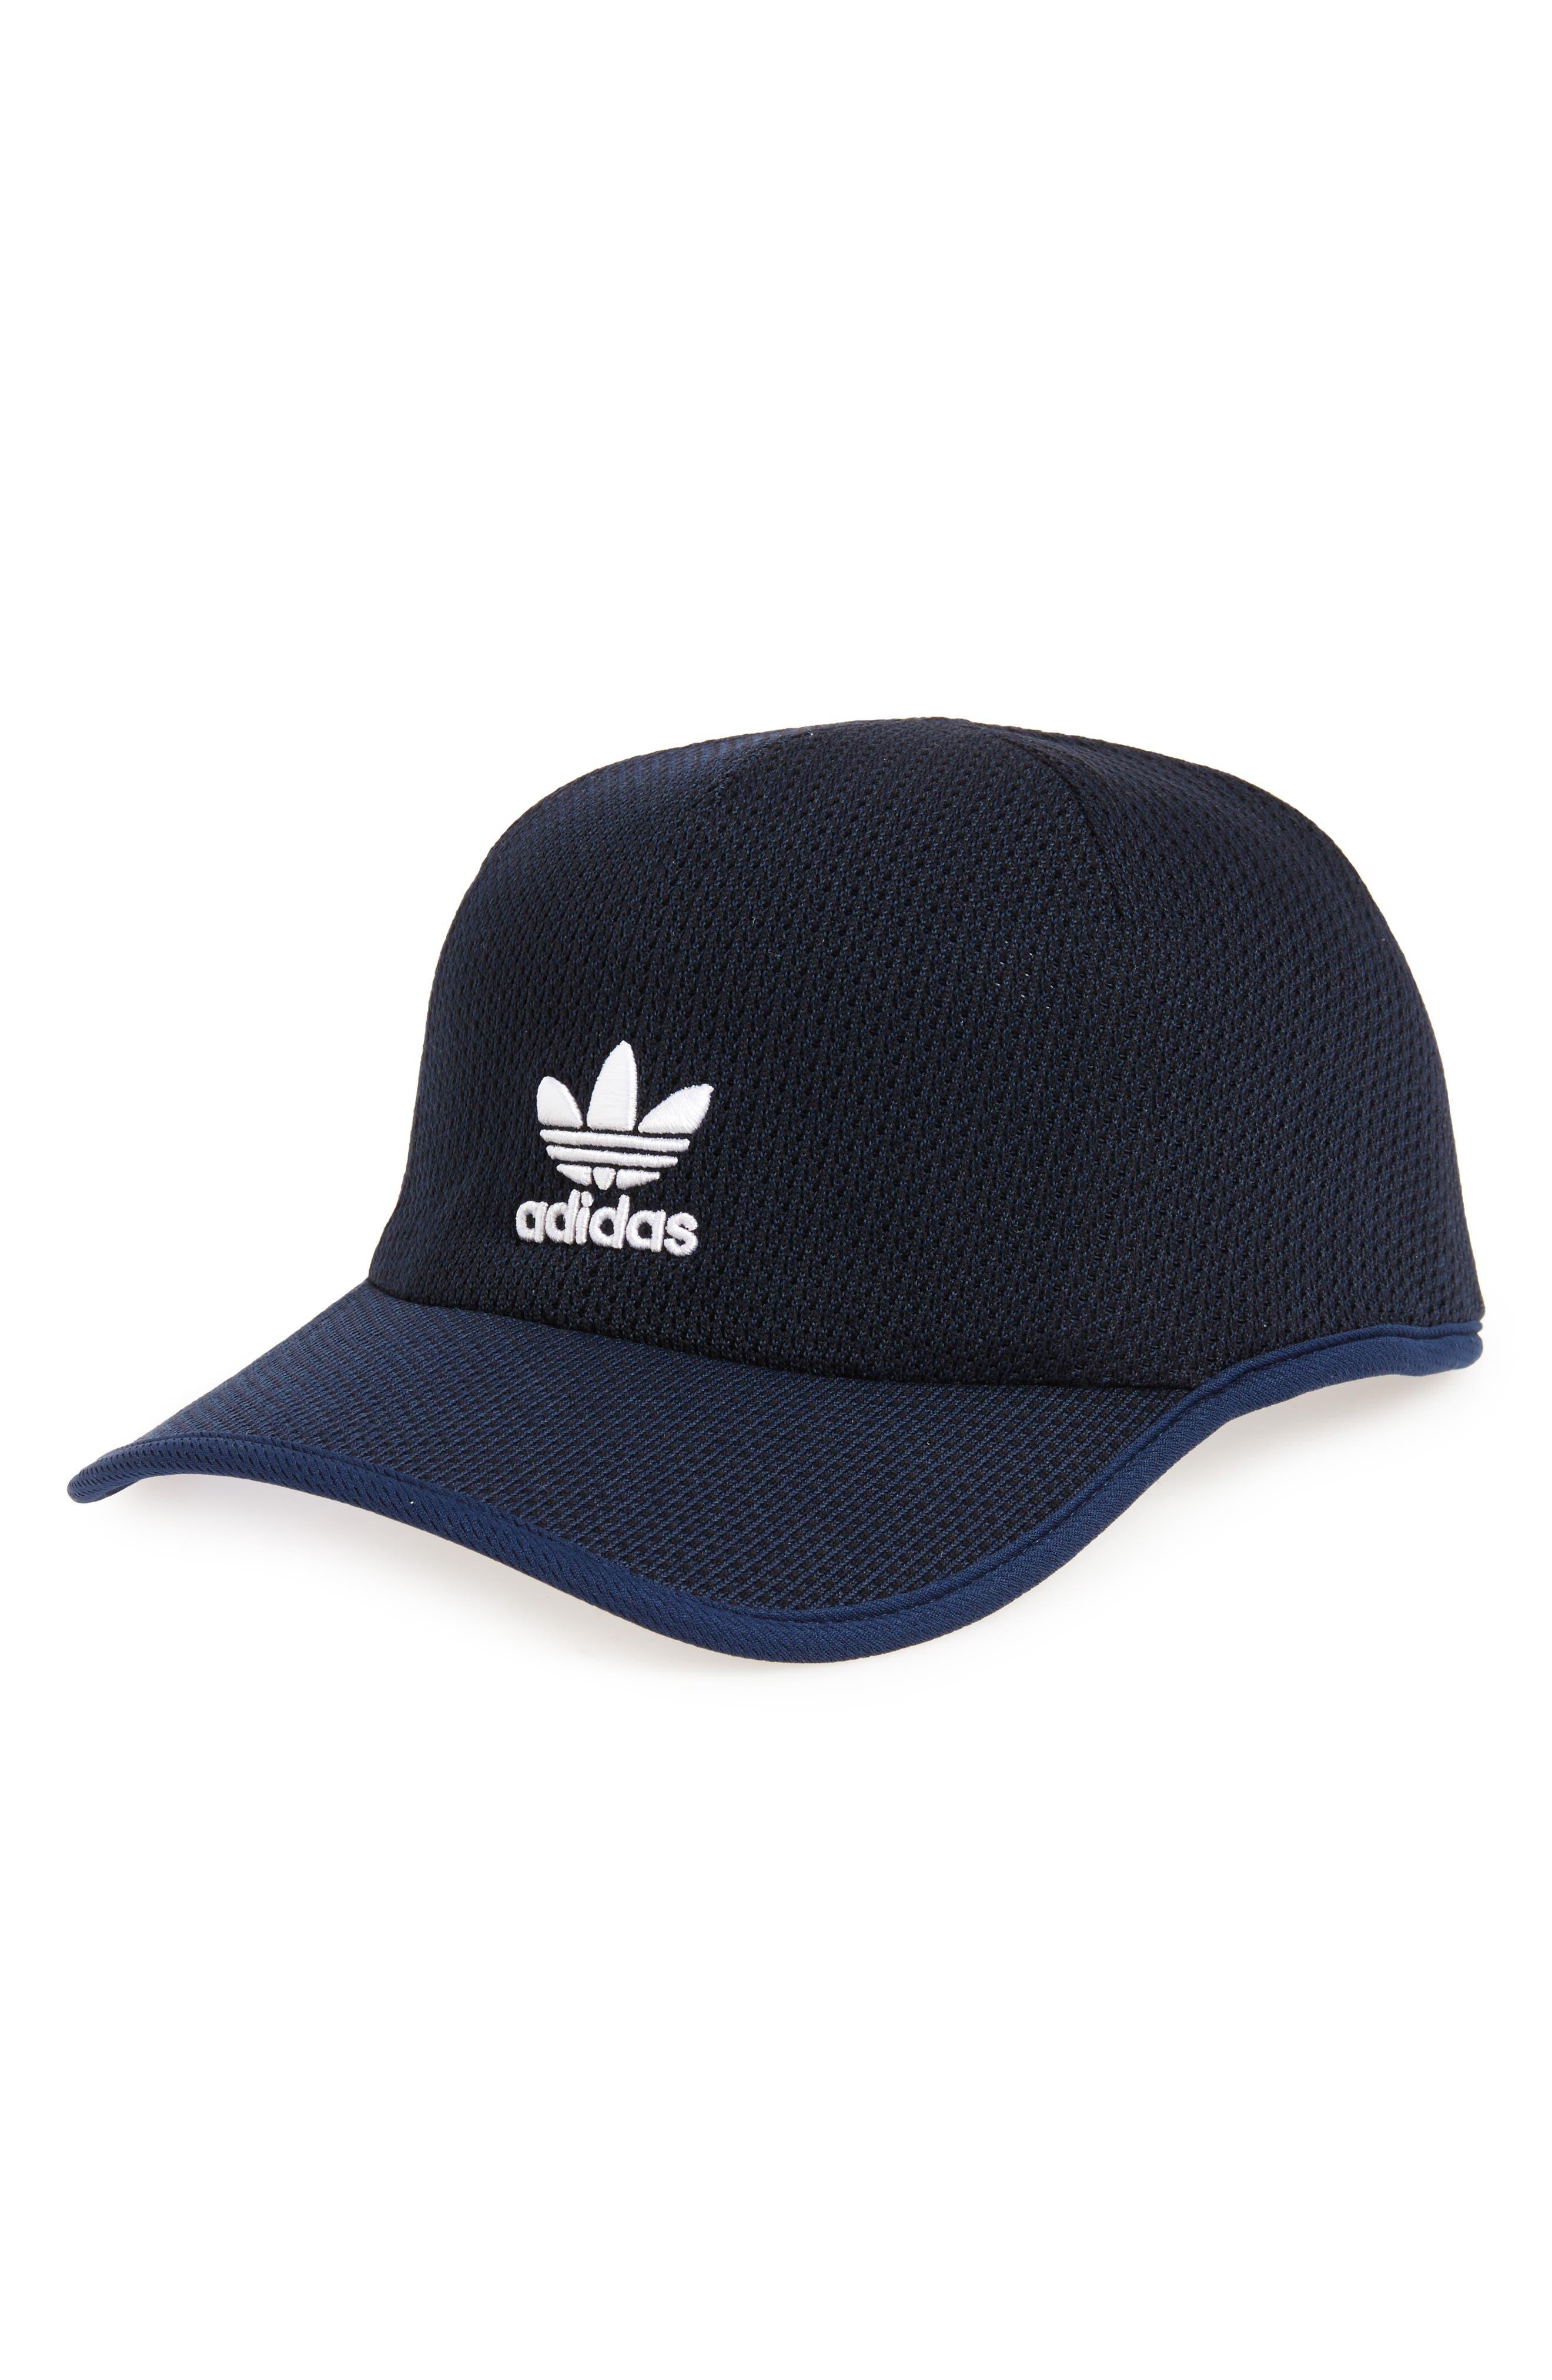 adidas Originals Prime Baseball Cap